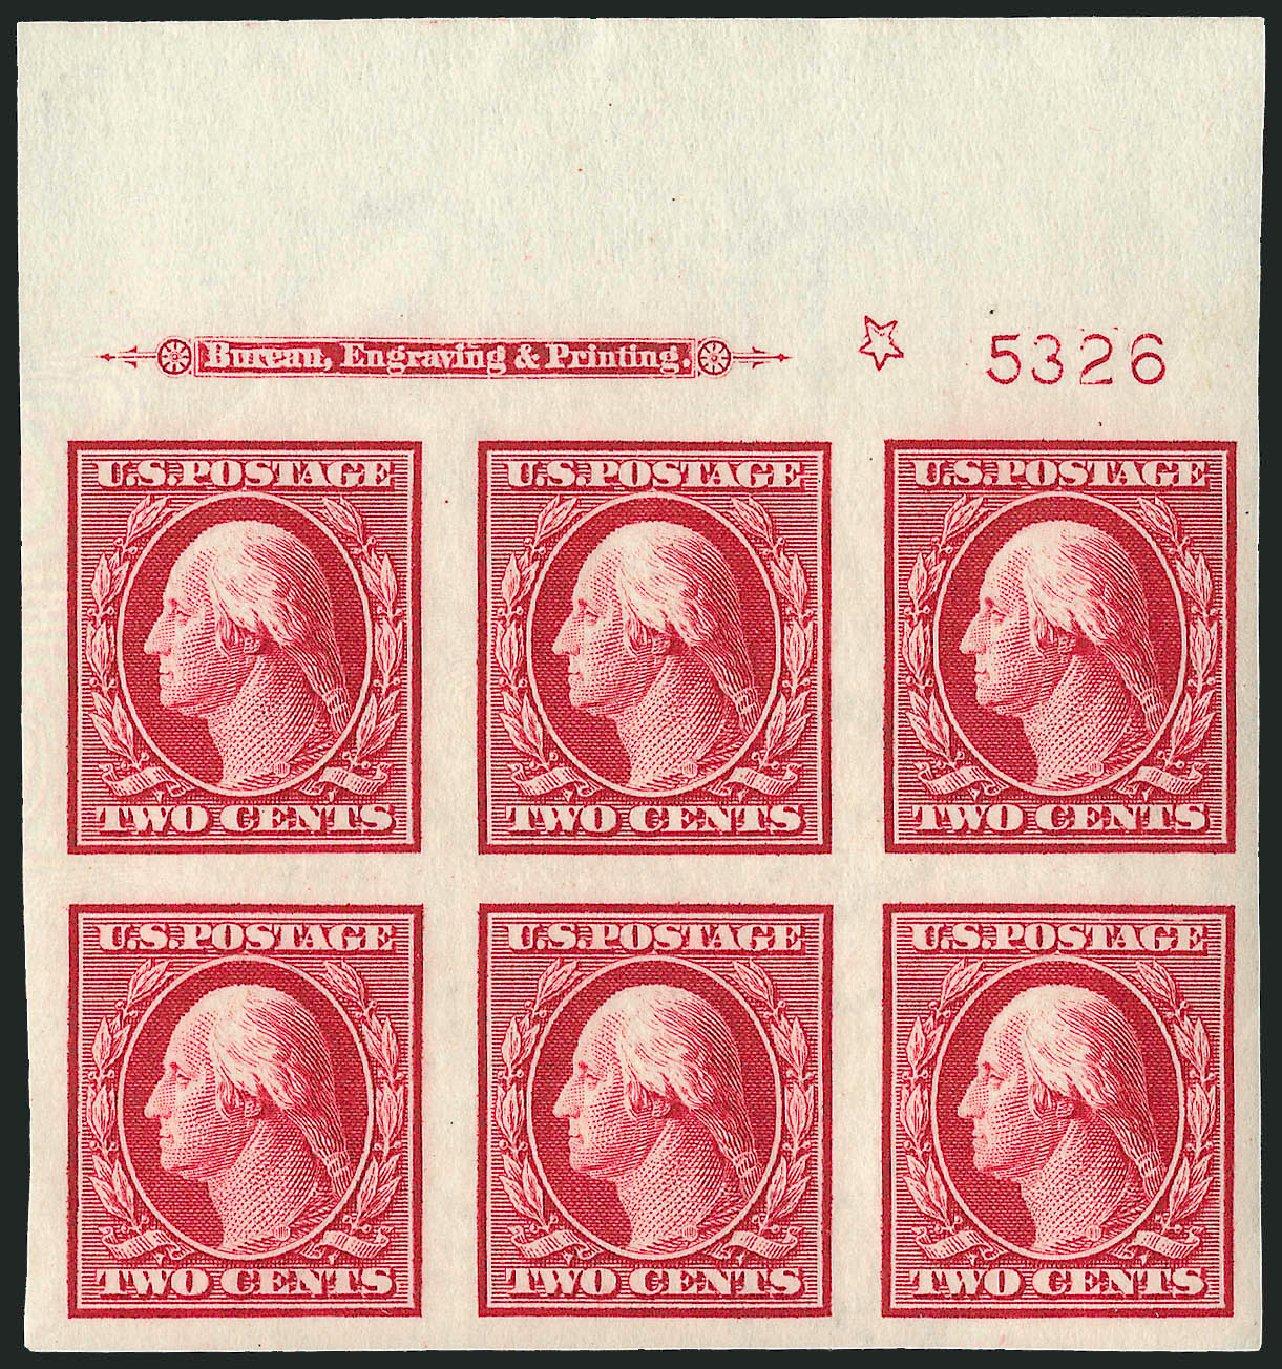 US Stamps Price Scott Cat. #344 - 1909 2c Washington Imperf. Robert Siegel Auction Galleries, Apr 2009, Sale 971, Lot 1538